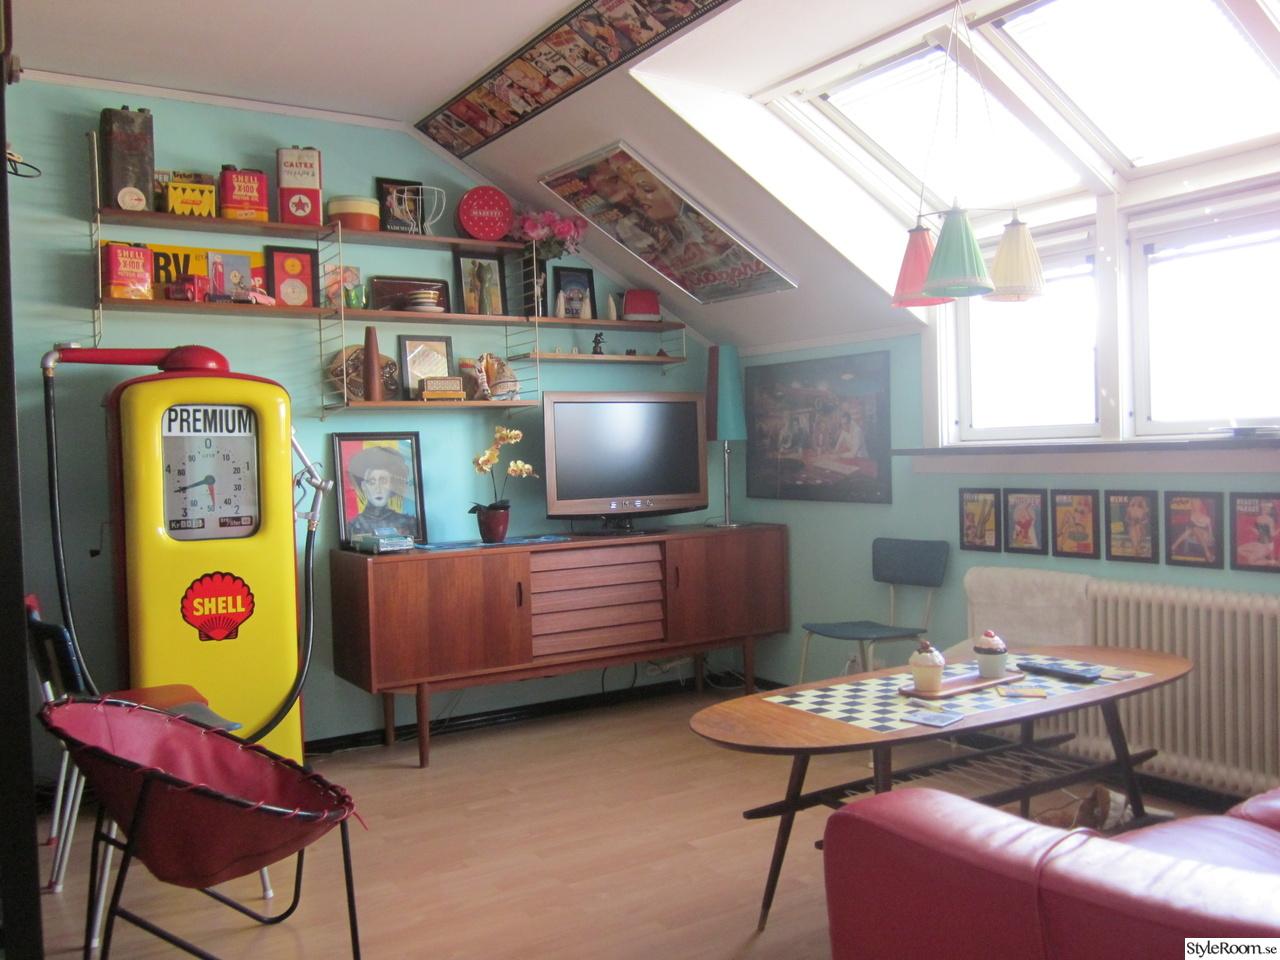 50-tal,retro,nostalgi,vardagsrum,teak,sideboard,soffbord,bensinpump ...